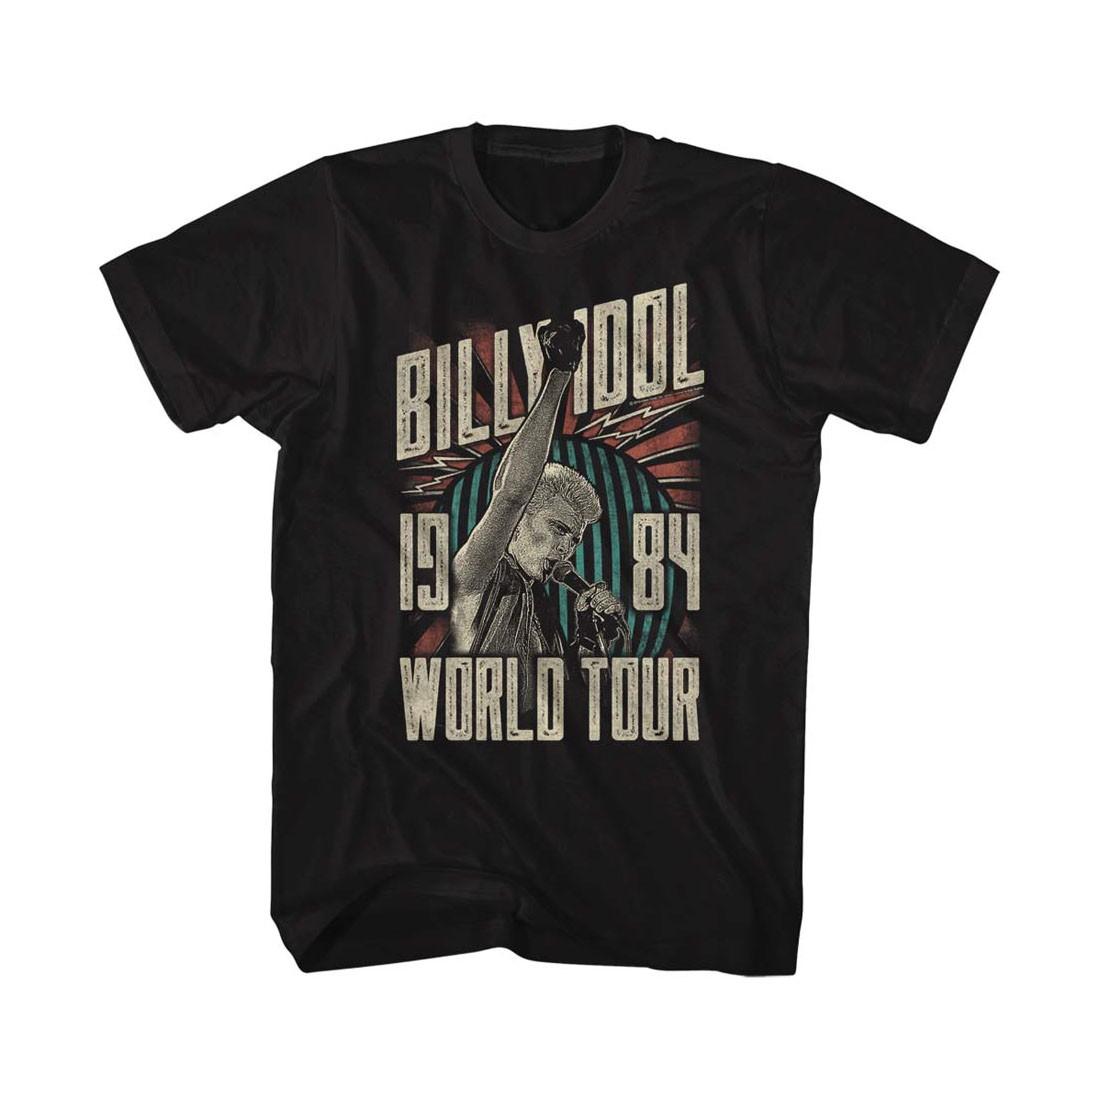 Billy Idol World Tour T-Shirt